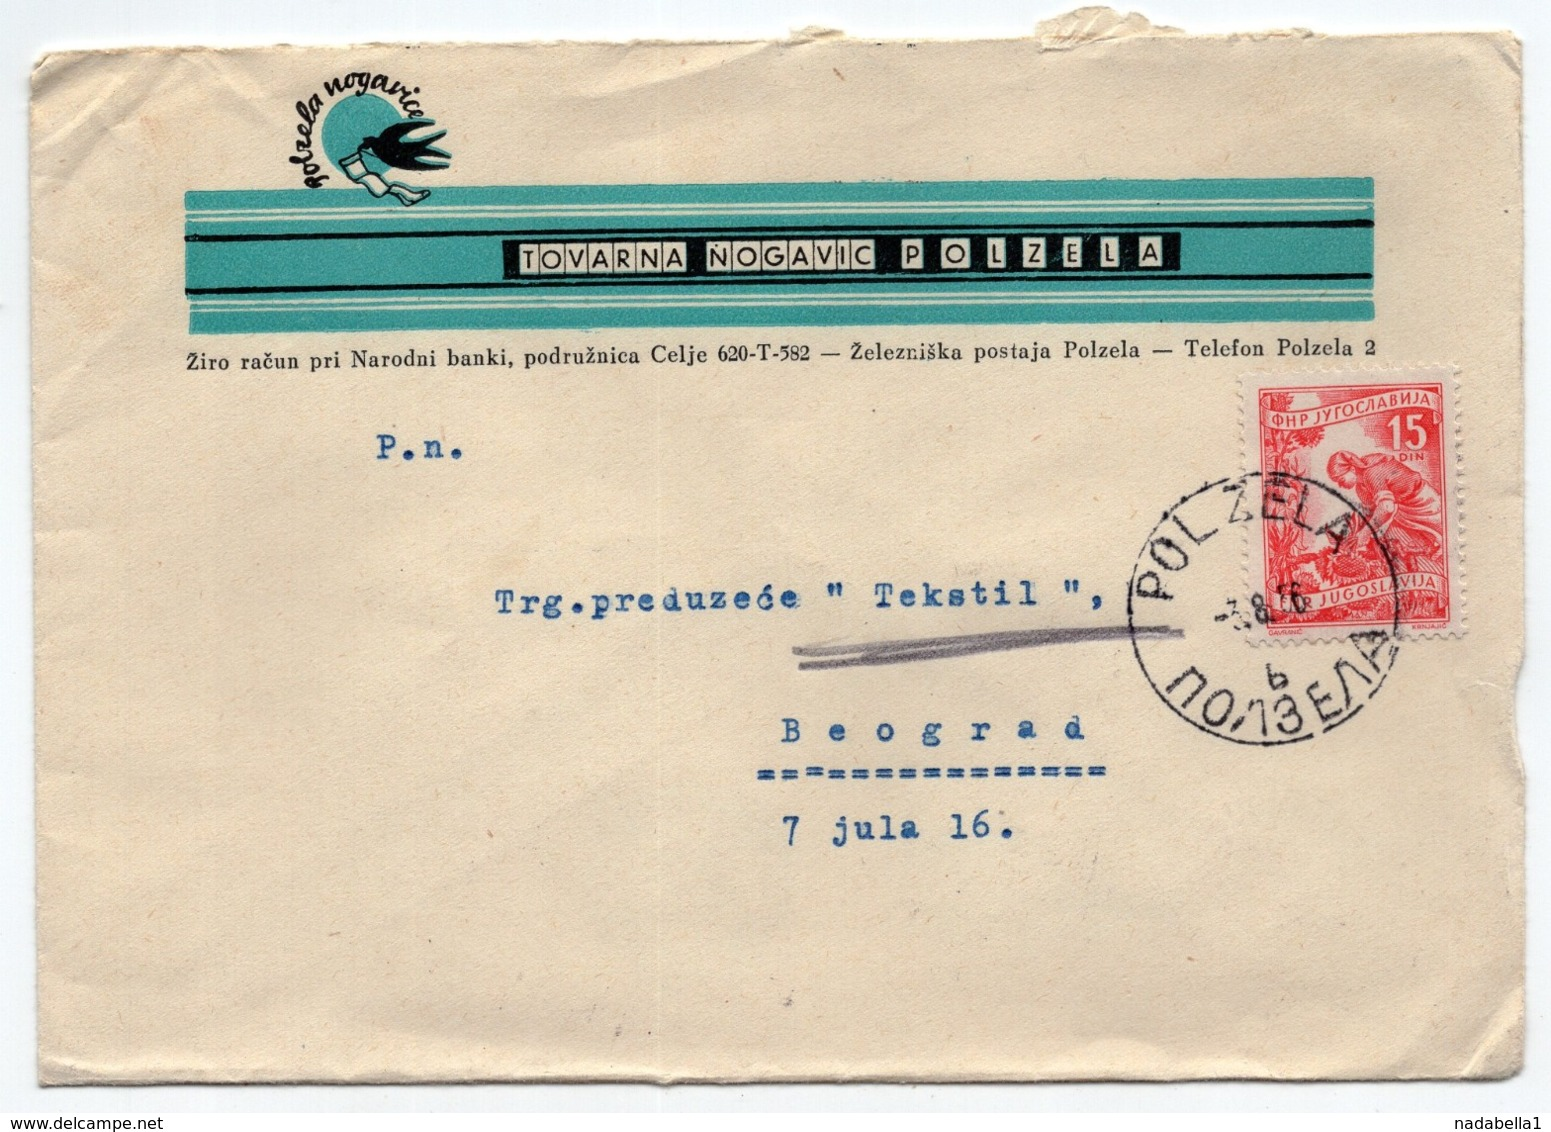 1956 YUGOSLAVIA, SLOVENIA, POLZELA TO BELGRADE, SOCKS MANUFACTURING COMPANY HEADCOVER - 1945-1992 Socialist Federal Republic Of Yugoslavia